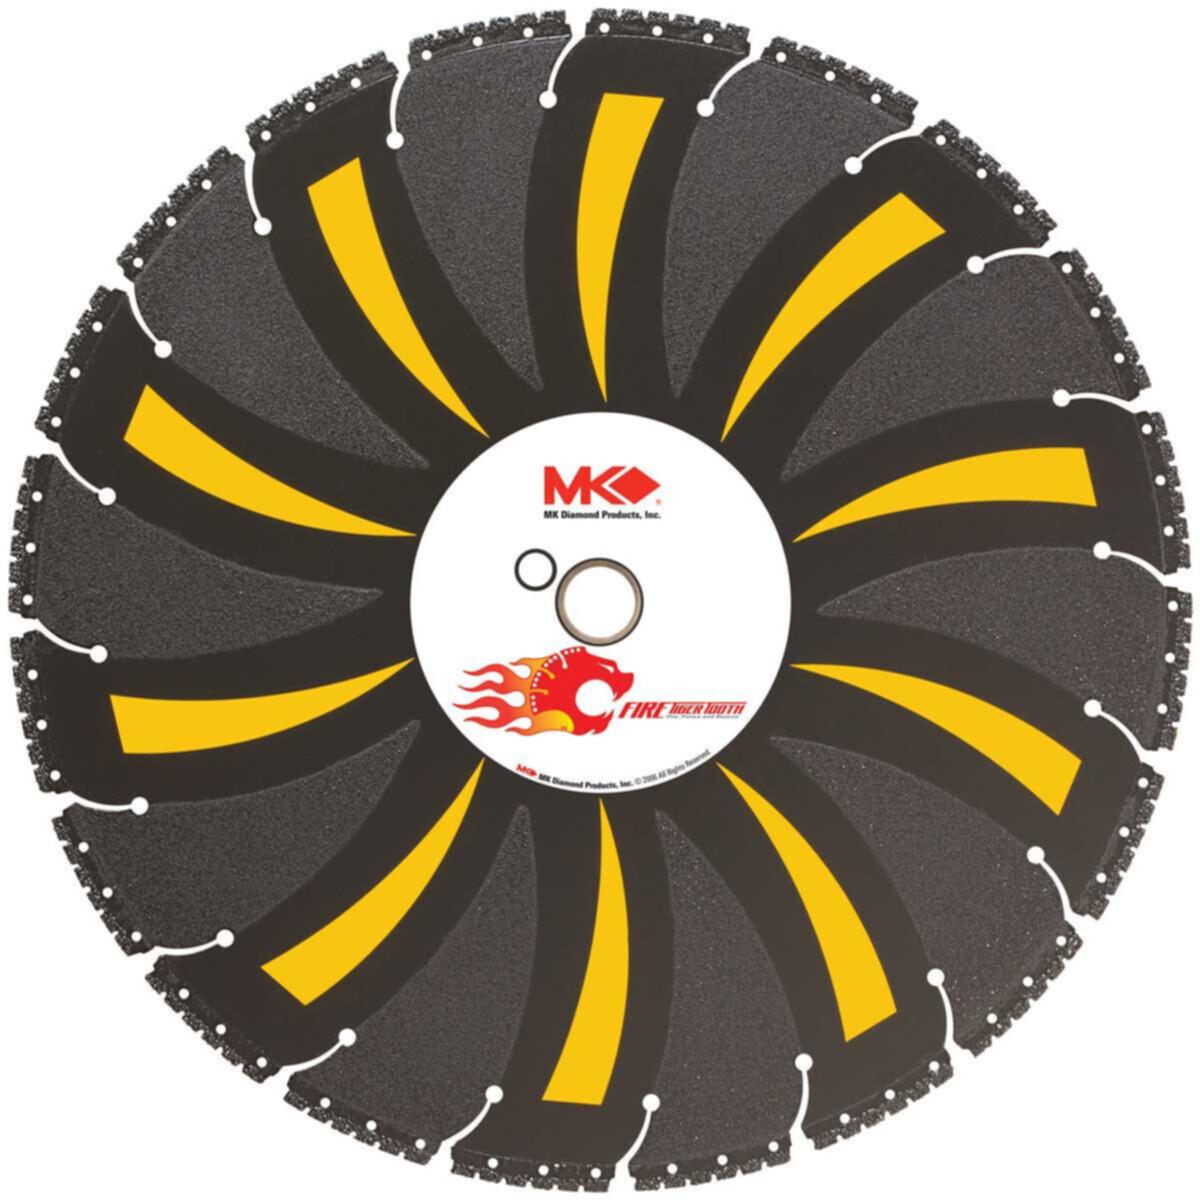 MK-404RCK Tiger Tooth Diamond Blade